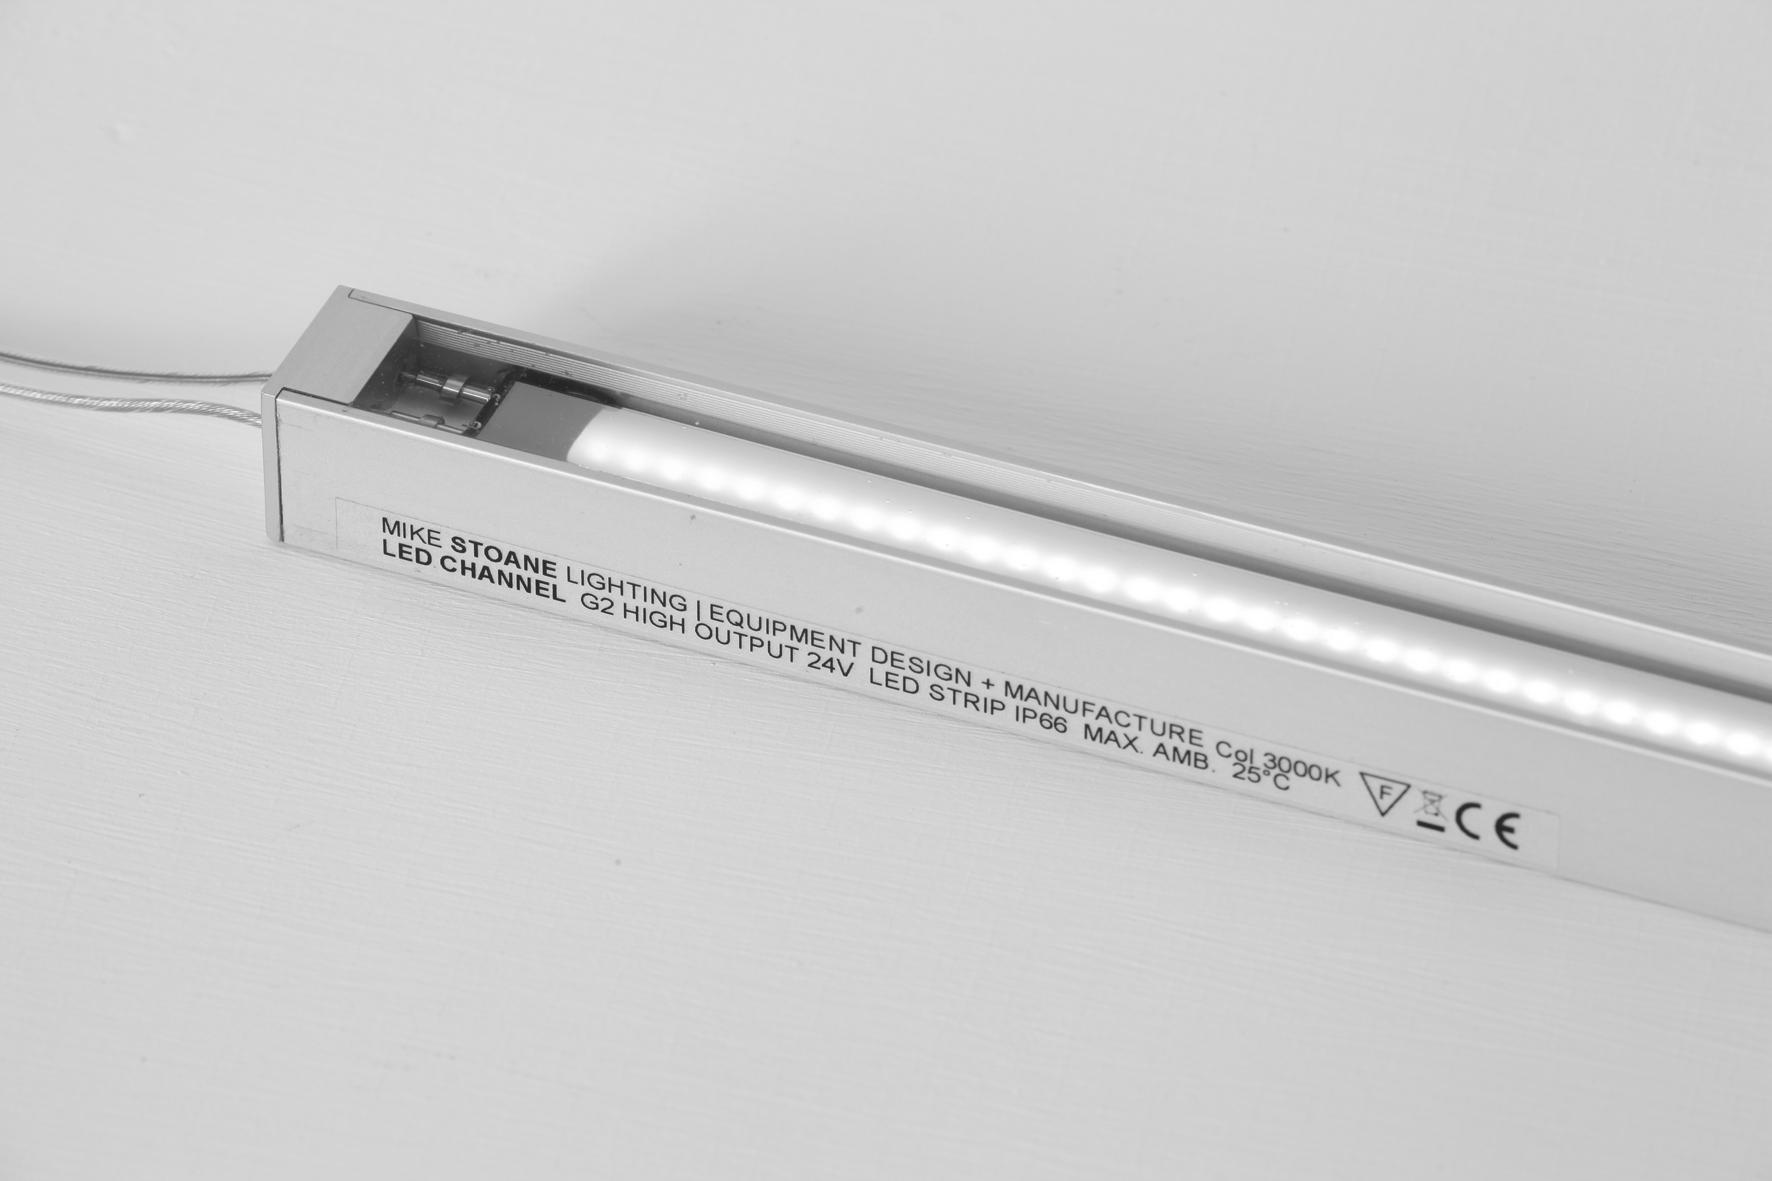 Afbeelding-MSL-exterior-led-channel